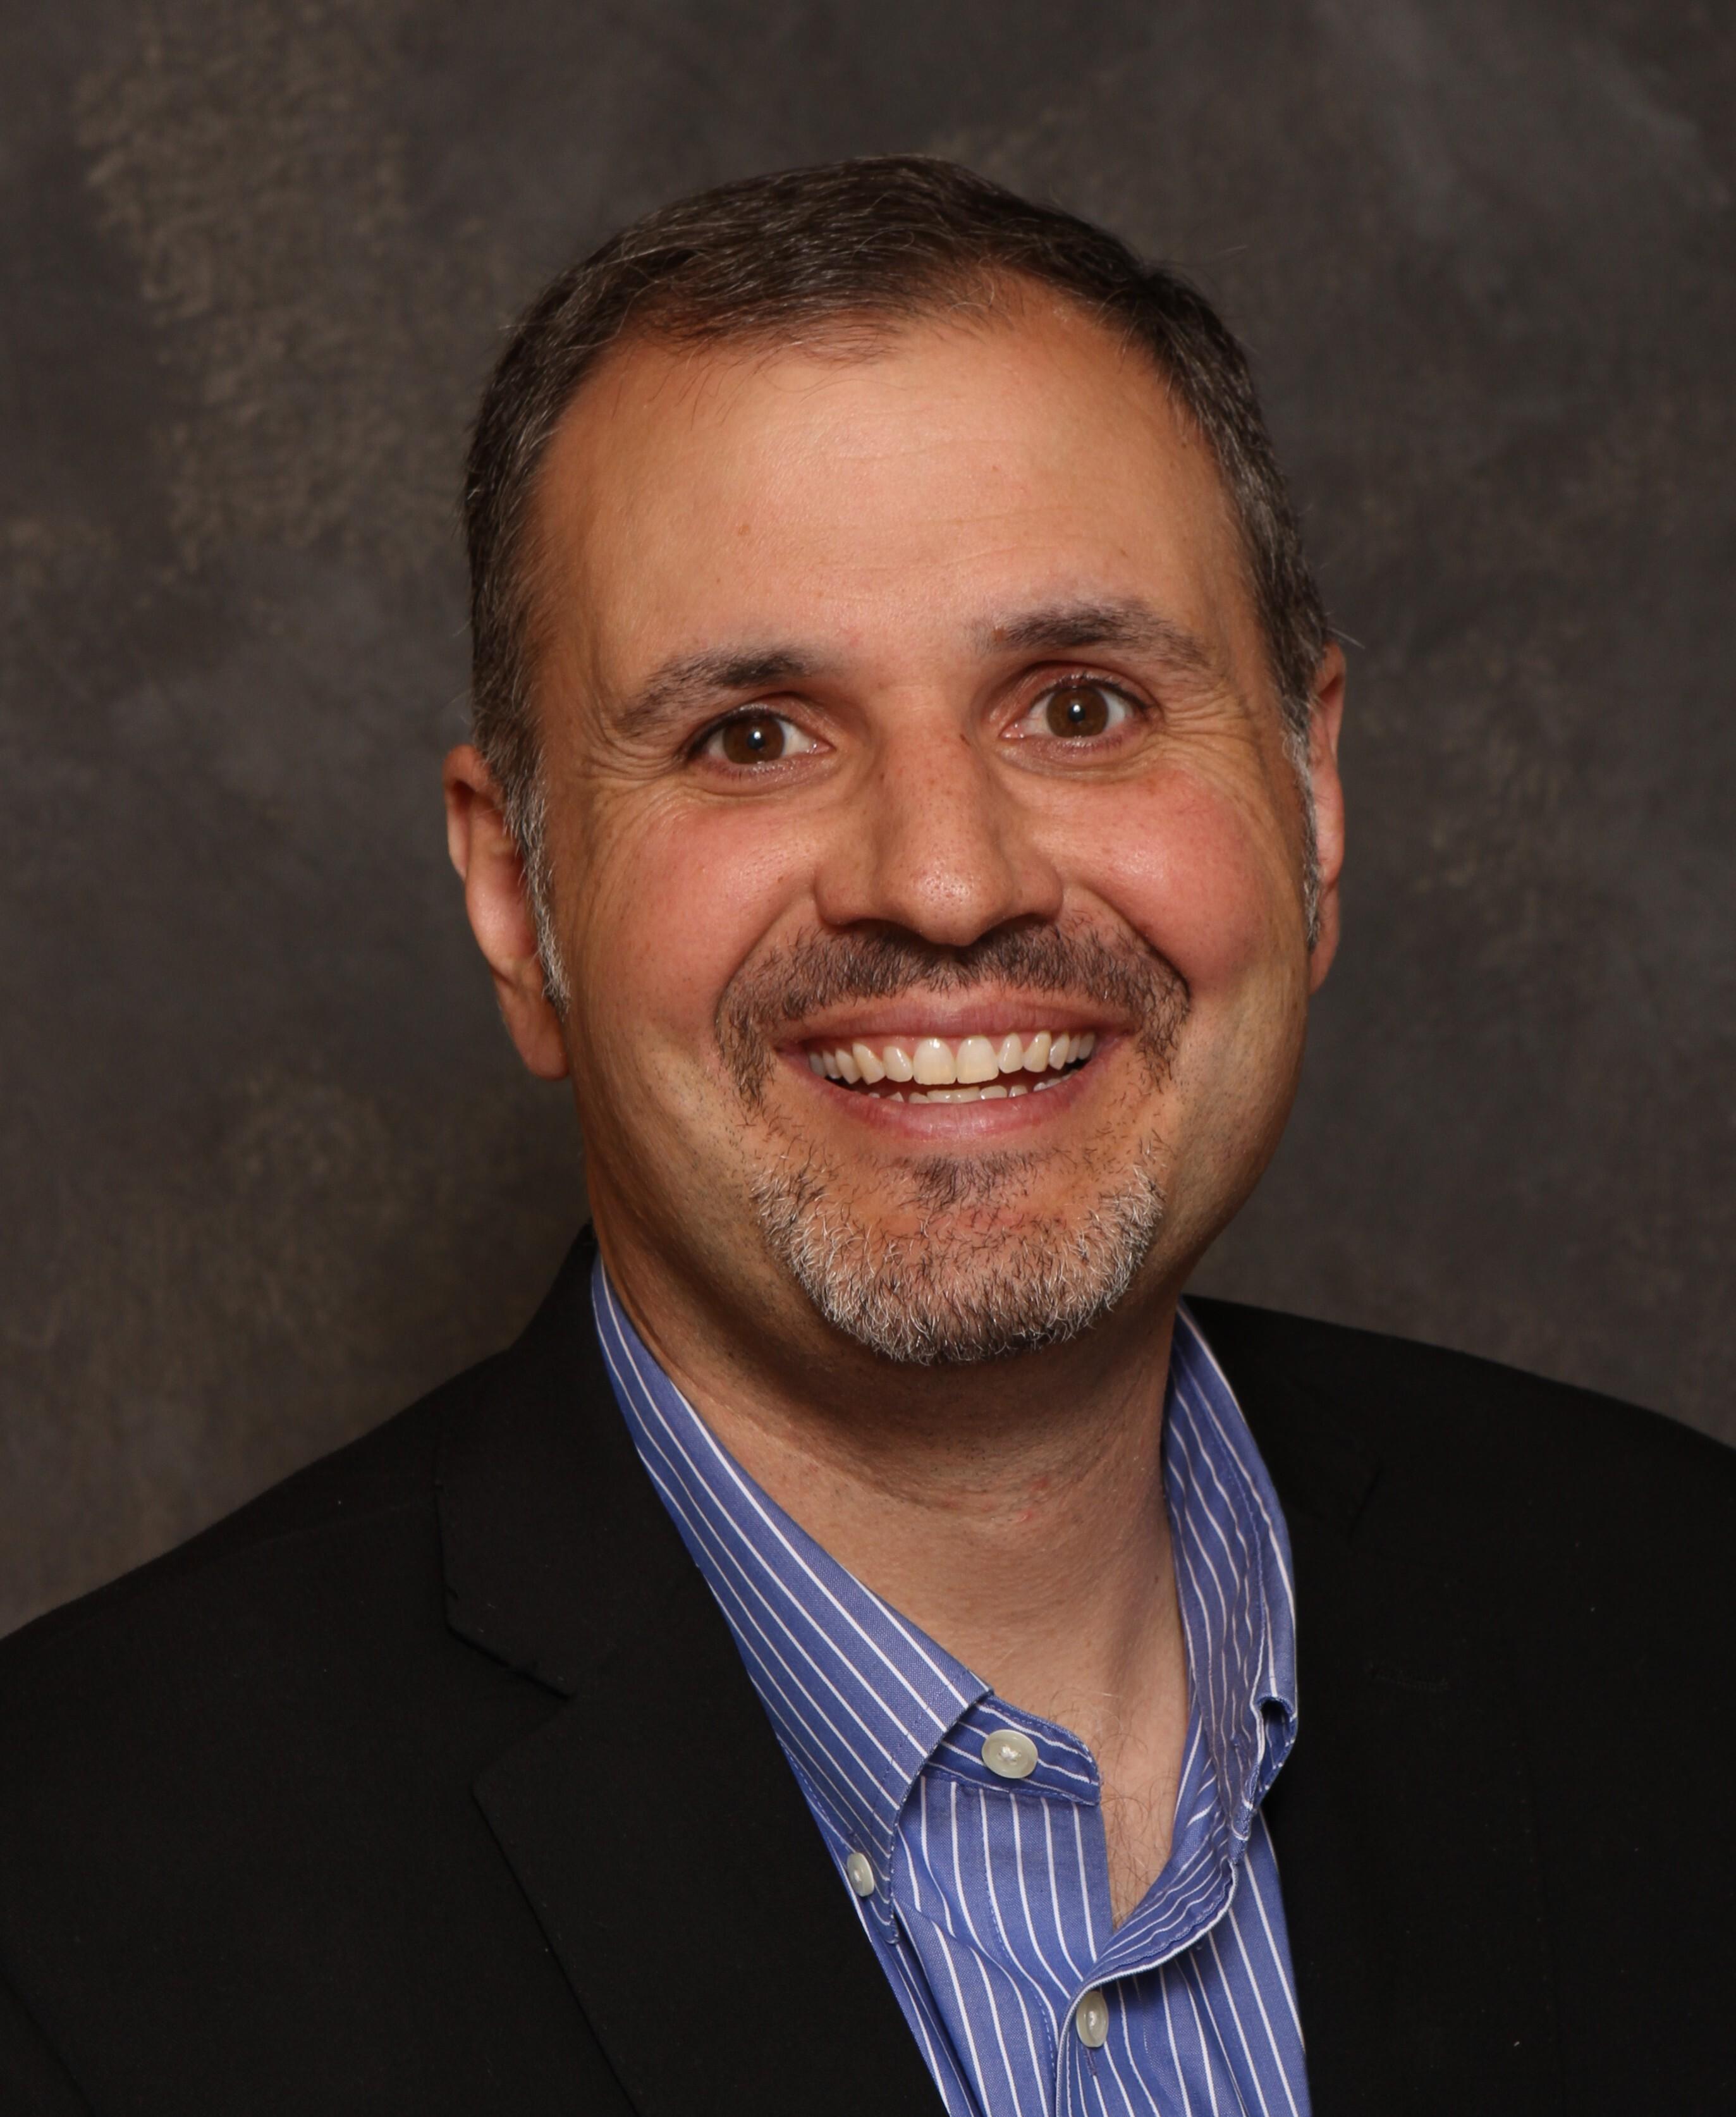 Jeff Borden